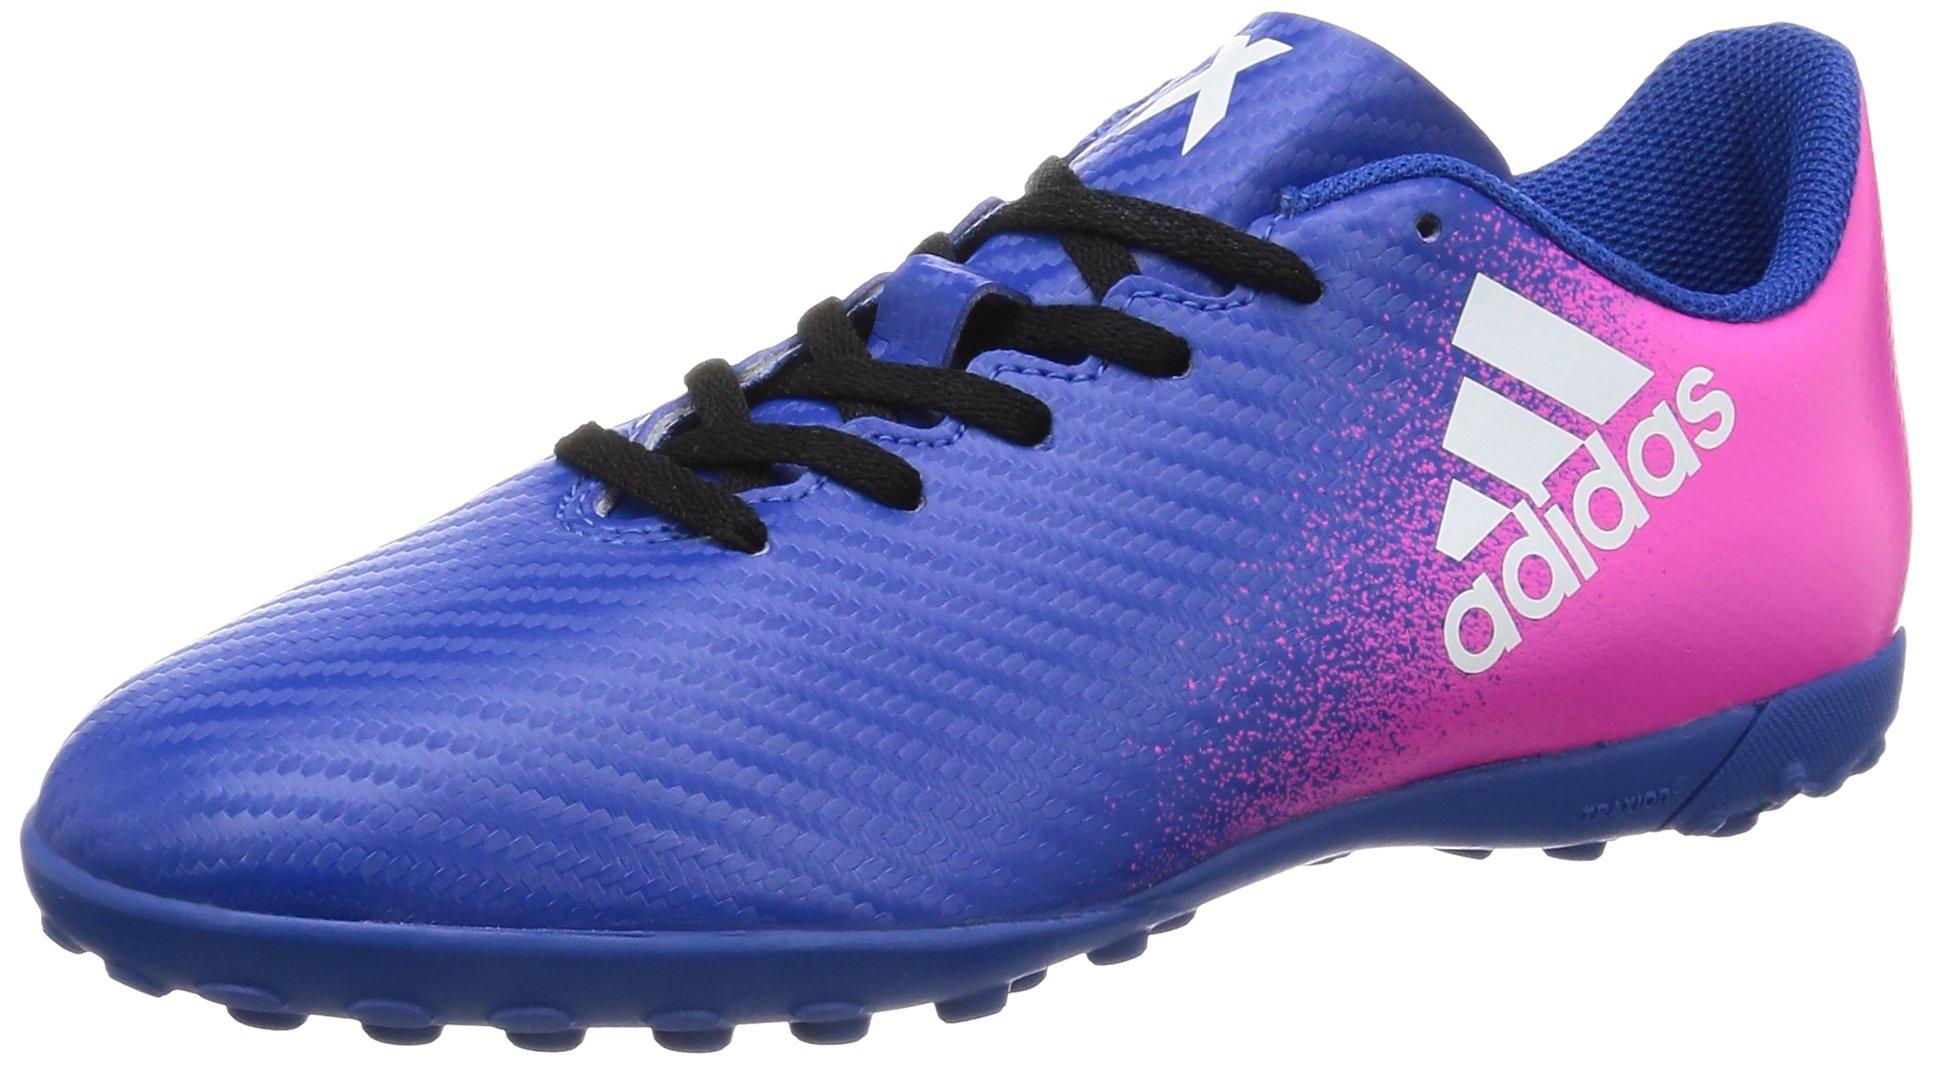 adidas Kids Soccer Shoes X 16.4 Turf Junior Football Futsal Boots BB5725 New (EU 30 - UK 11.5k - US 12k) by adidas